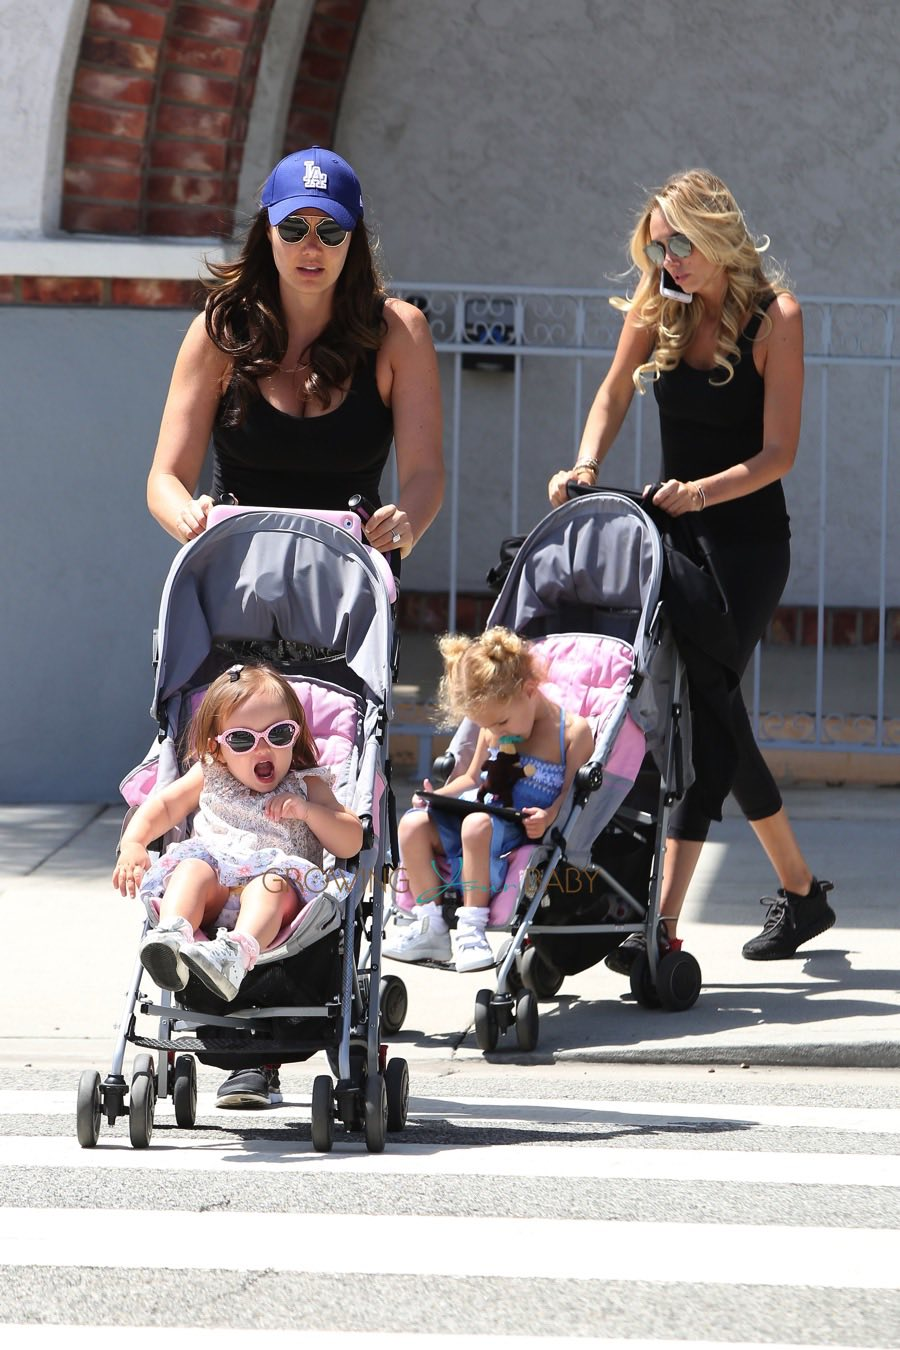 Petra Ecclestone Stunt and Tamara Ecclestone out in LA with their daughters Lavinia and Sophia